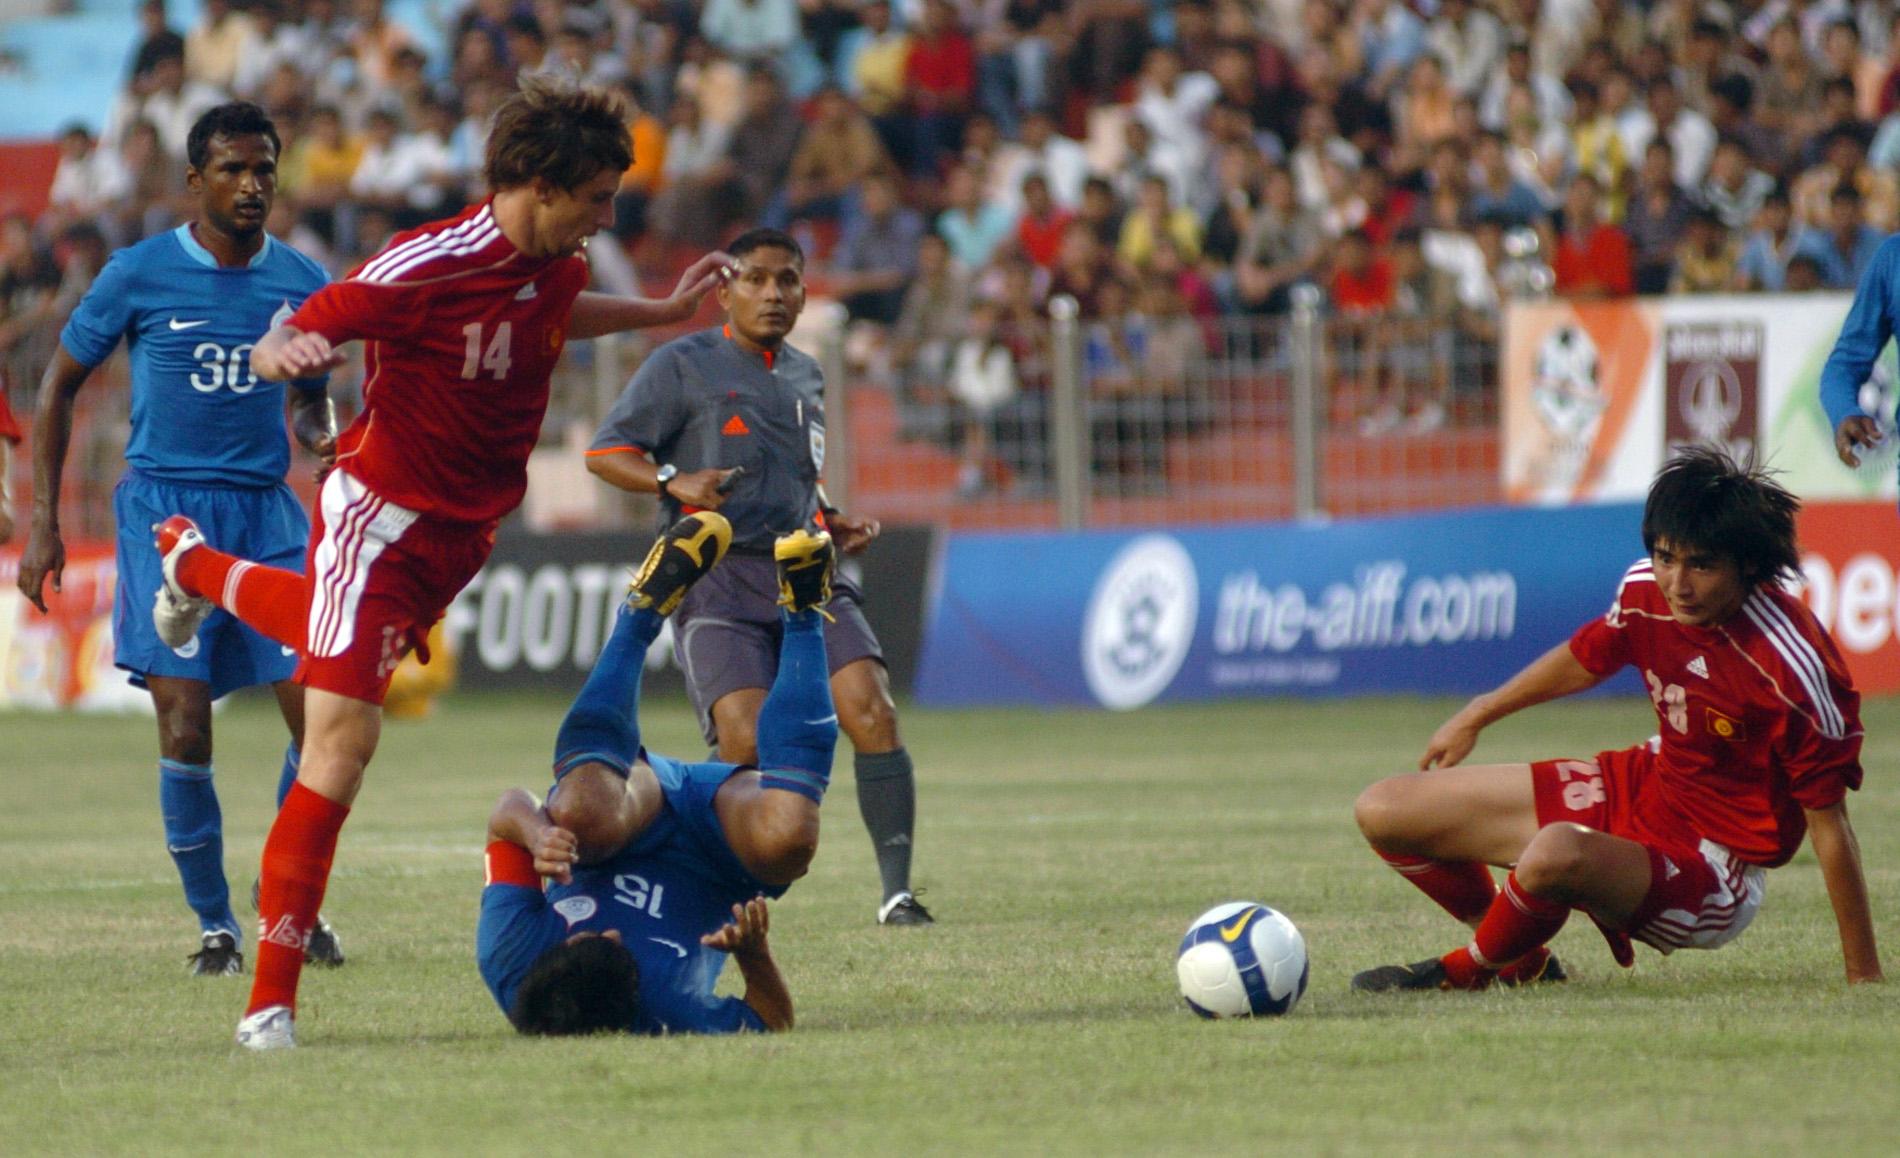 India Kyrgyzstan Nehru Cup 2009